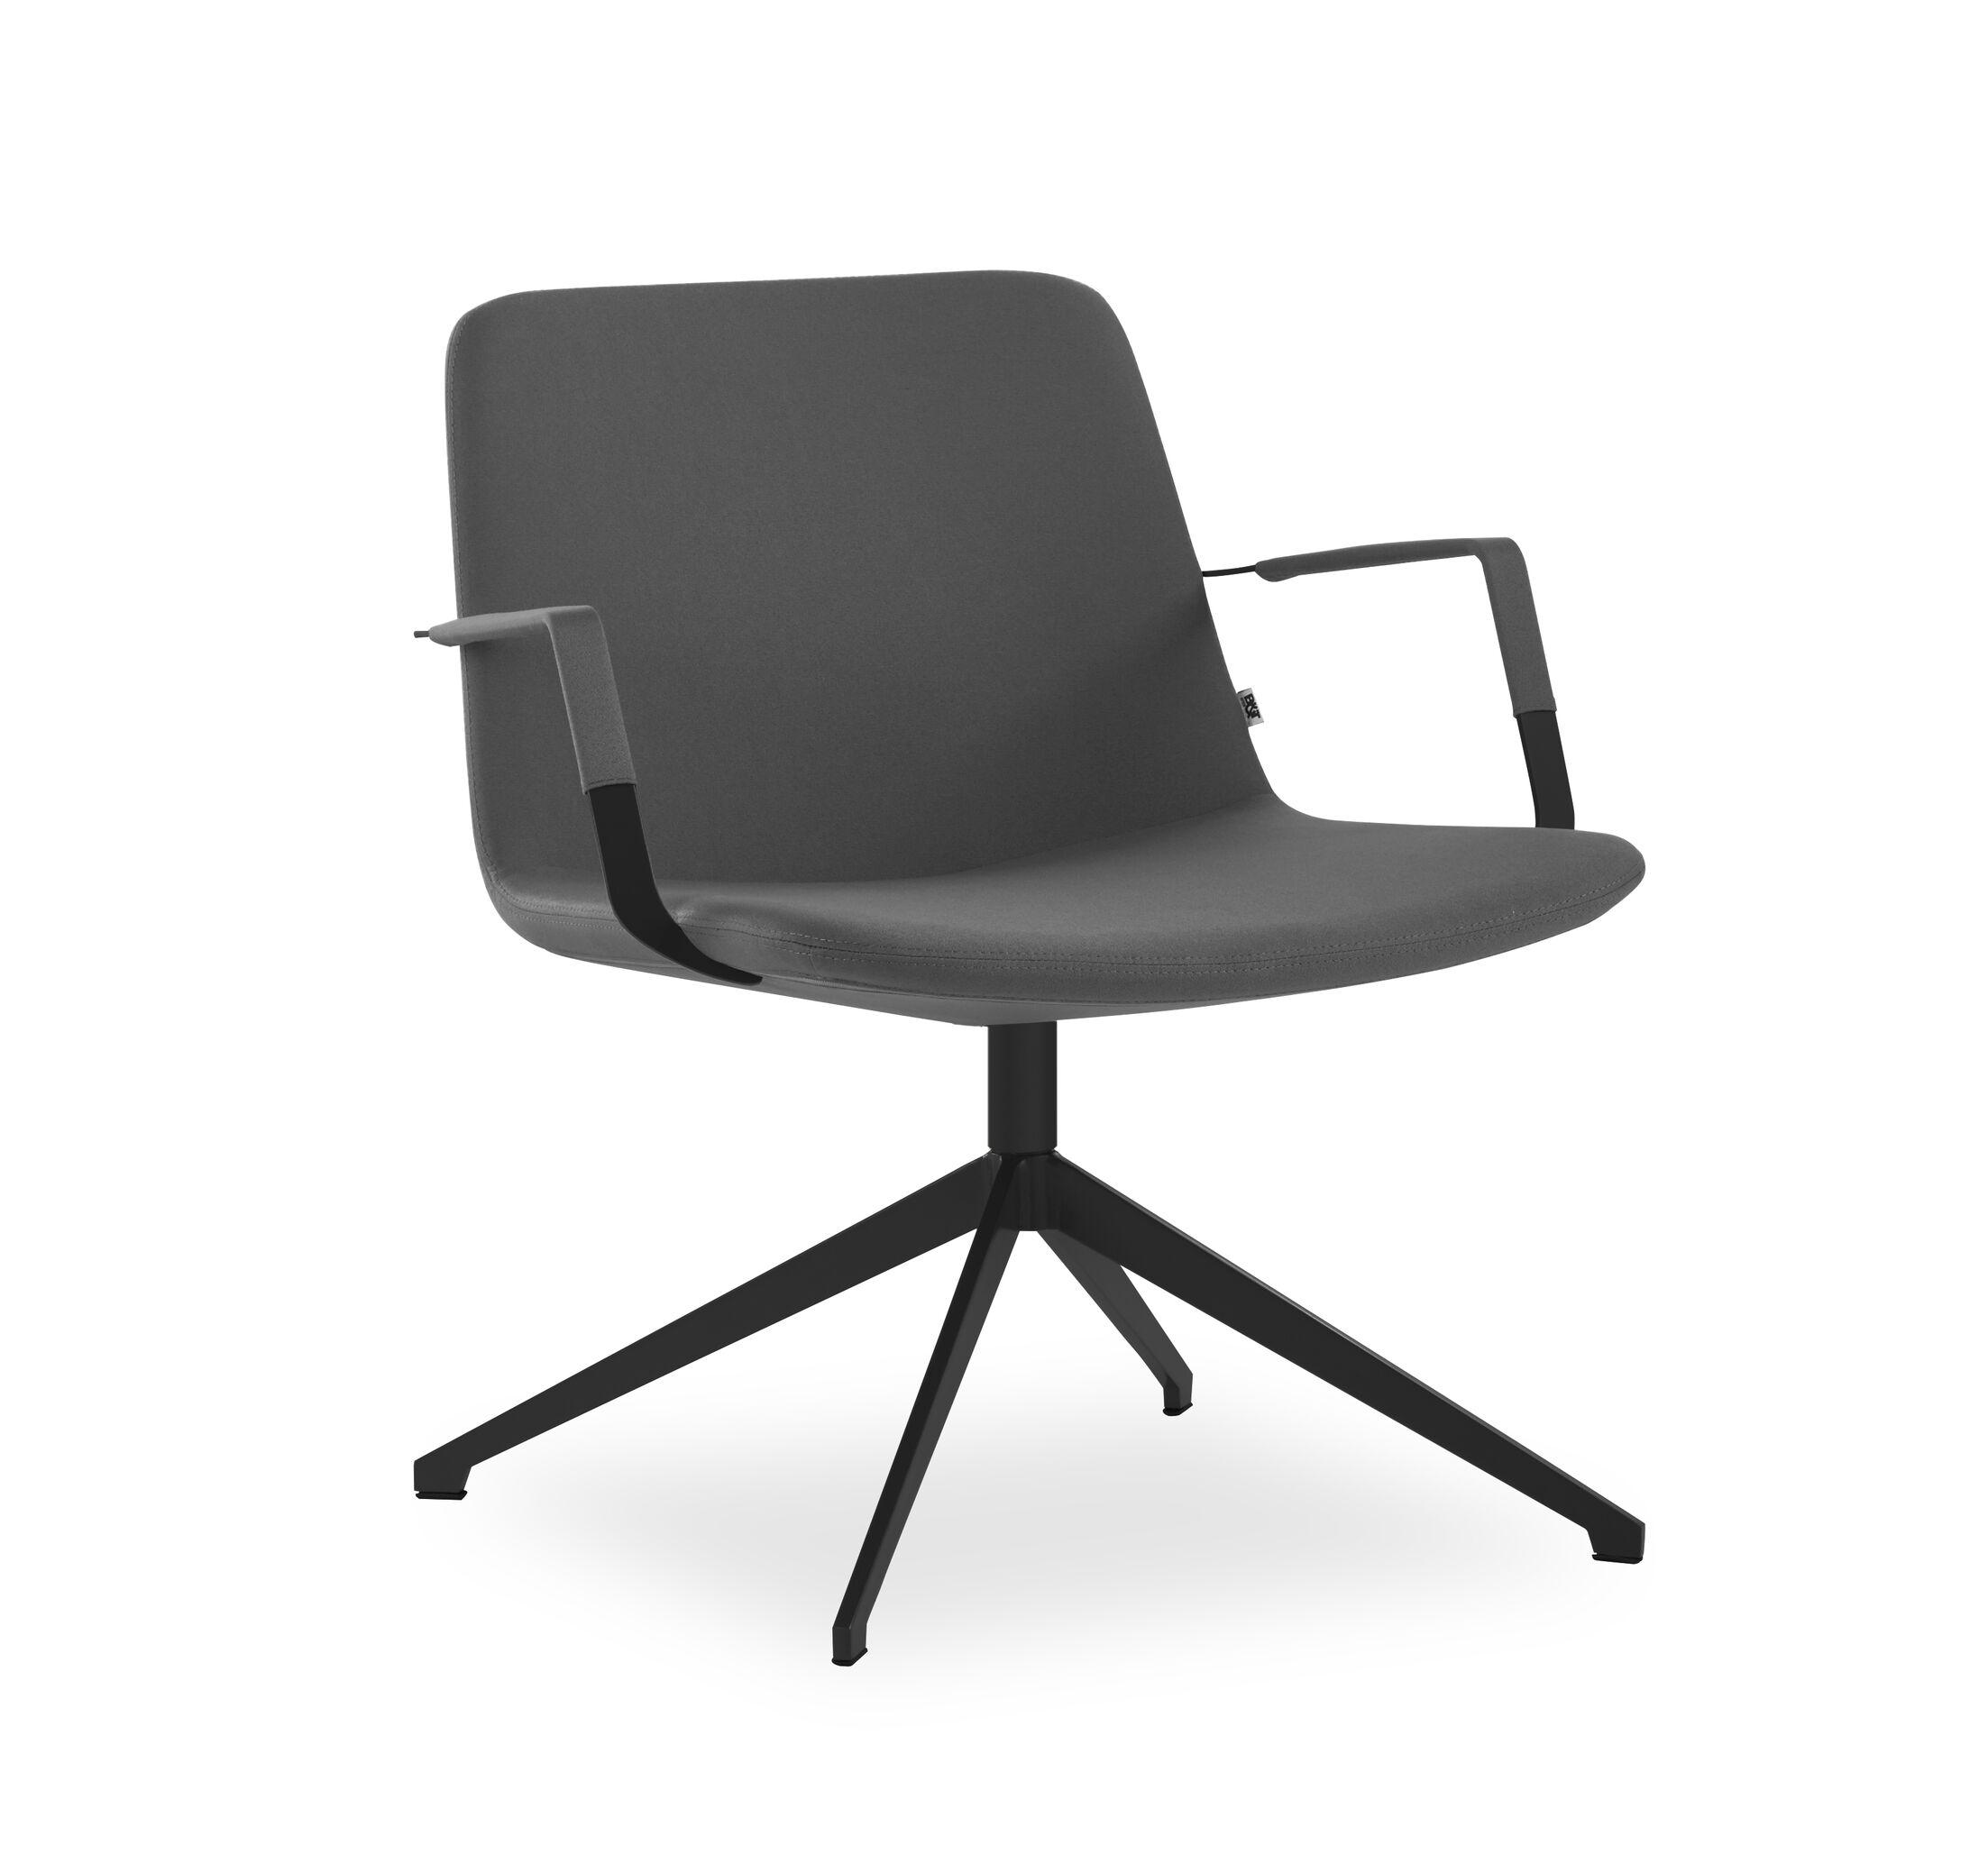 Fechteler Swivel Lounge Chair Seat Color: Antracite, Finish: Black